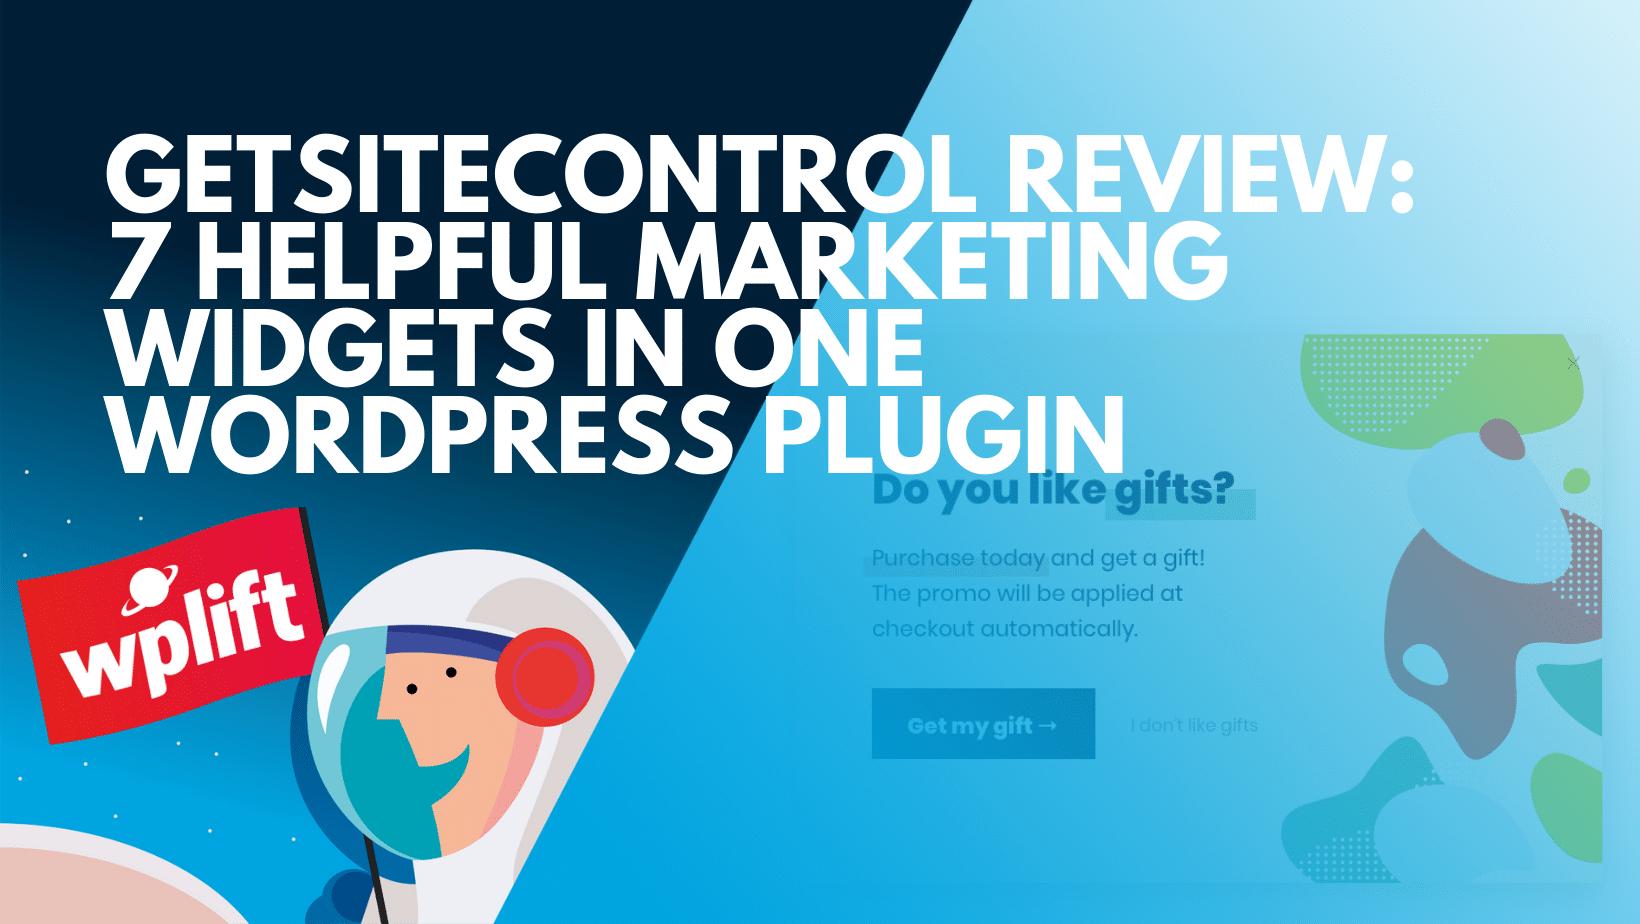 GetSiteControl Review: 7 Helpful Marketing Widgets In One WordPress Plugin